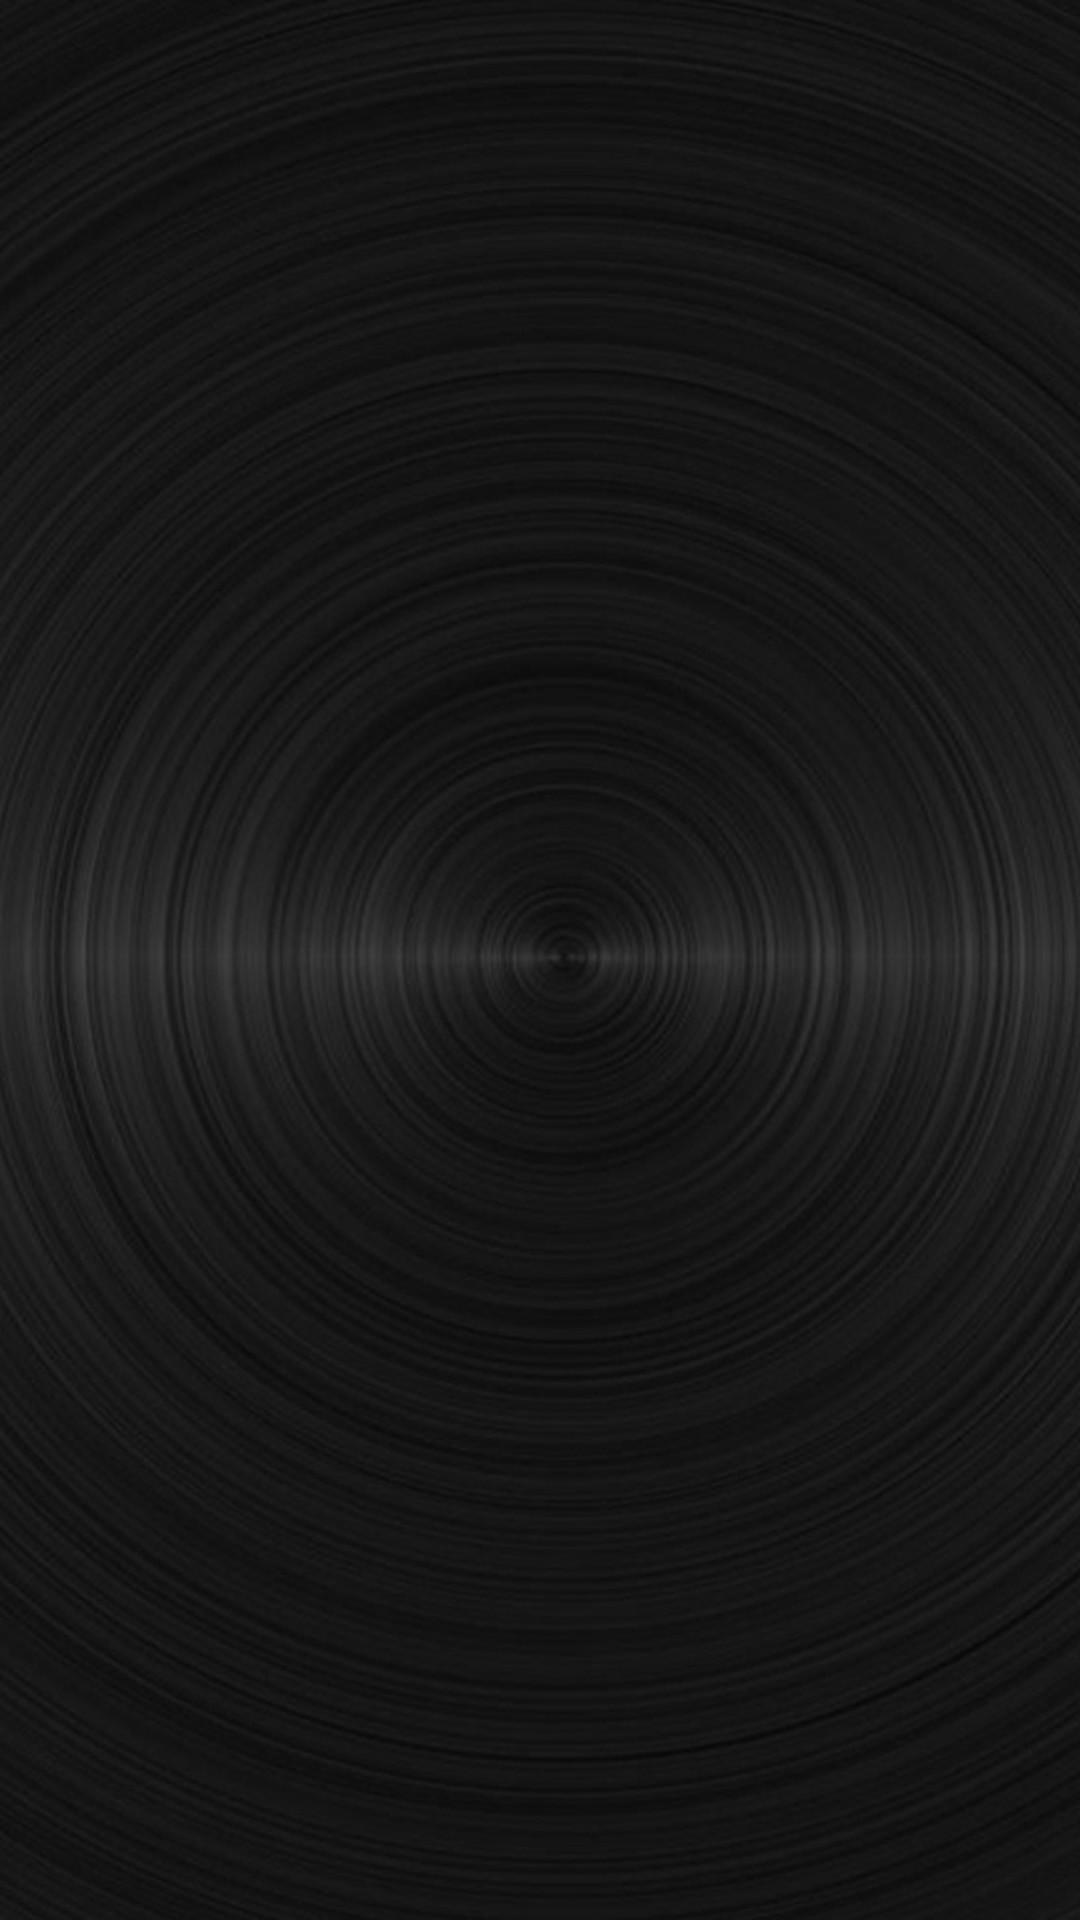 Solid Black Iphone Wallpaper Data Src Black Colour Wallpaper Hd 1080x1920 Download Hd Wallpaper Wallpapertip